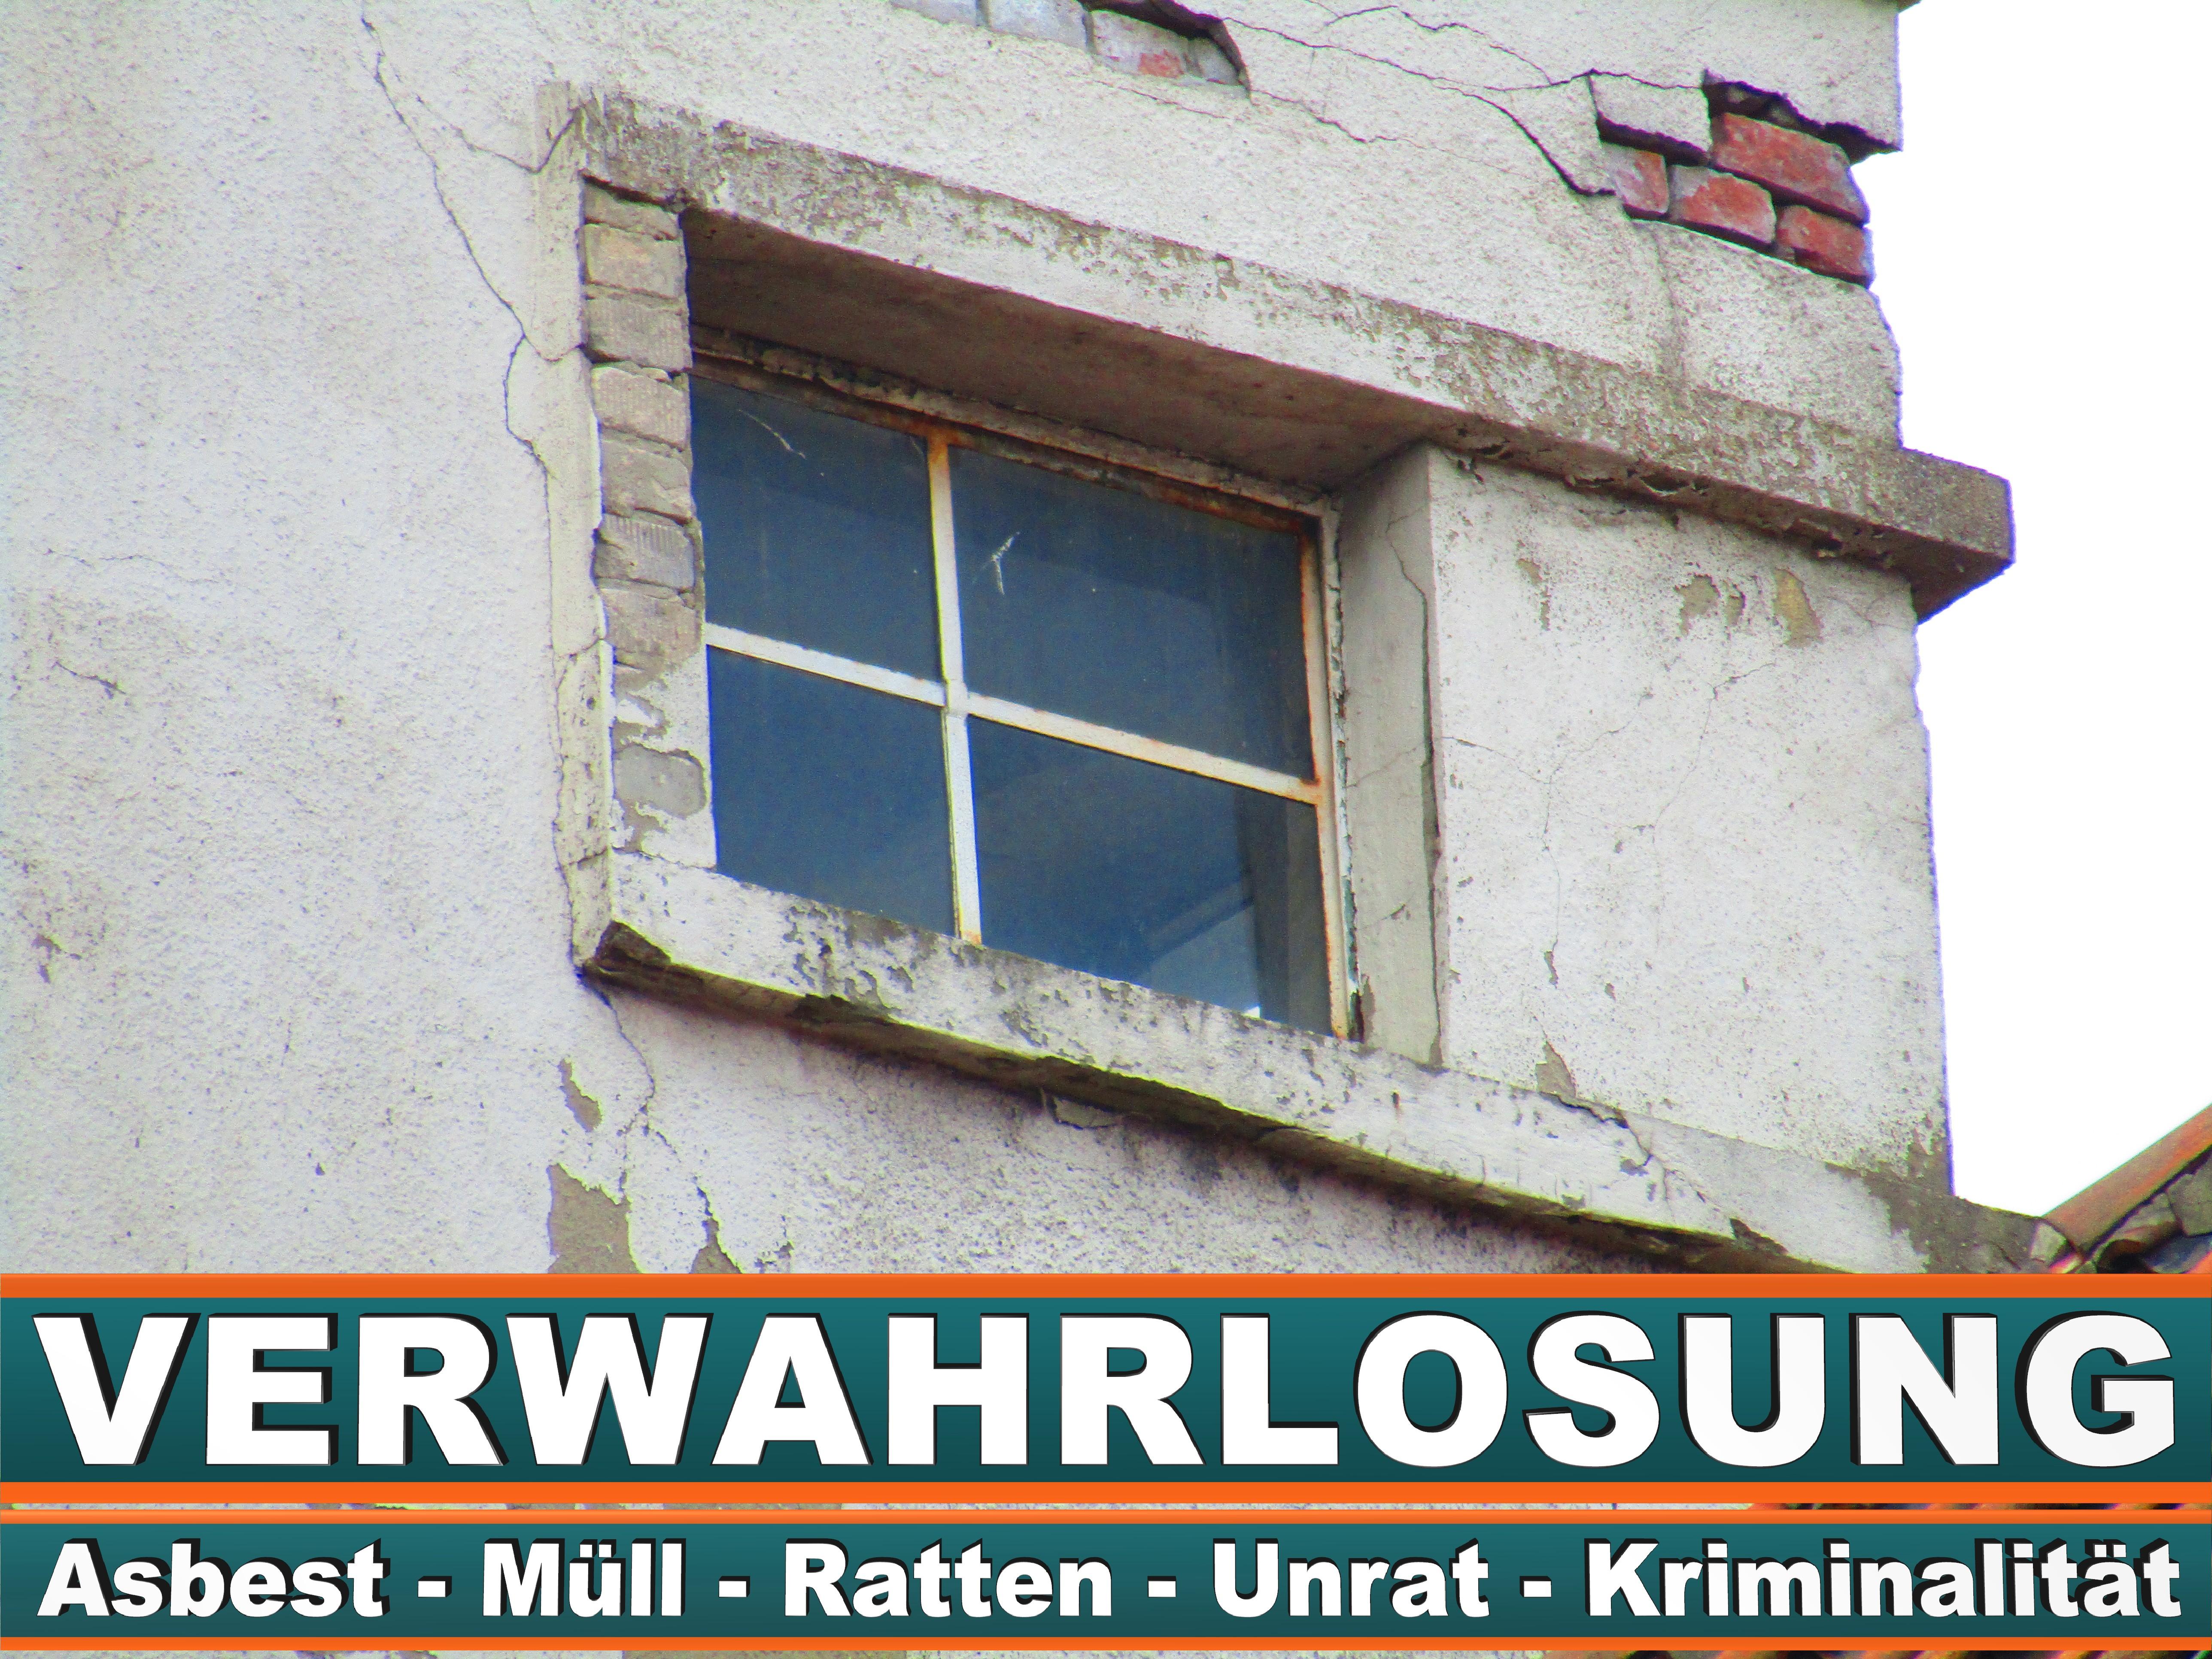 HOCH HINAUS GMBH CHRISTIAN REINHARDT KERKSIEKWEG 27 33729 BIELEFELD